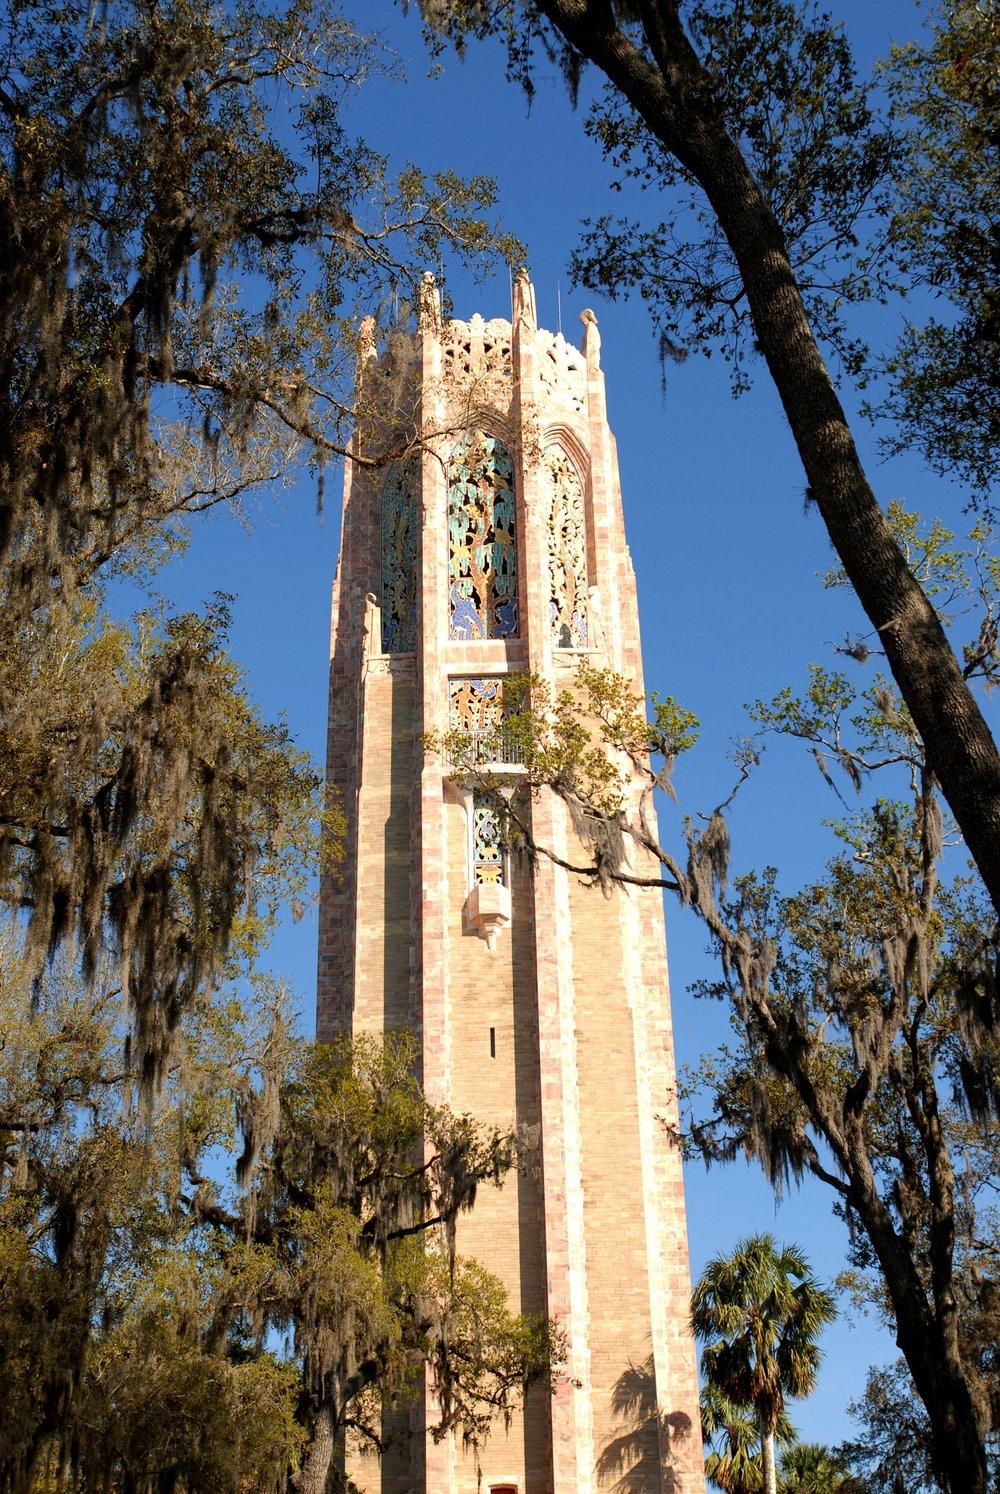 singing-tower-framed-by-trees_7881193704_o.jpg